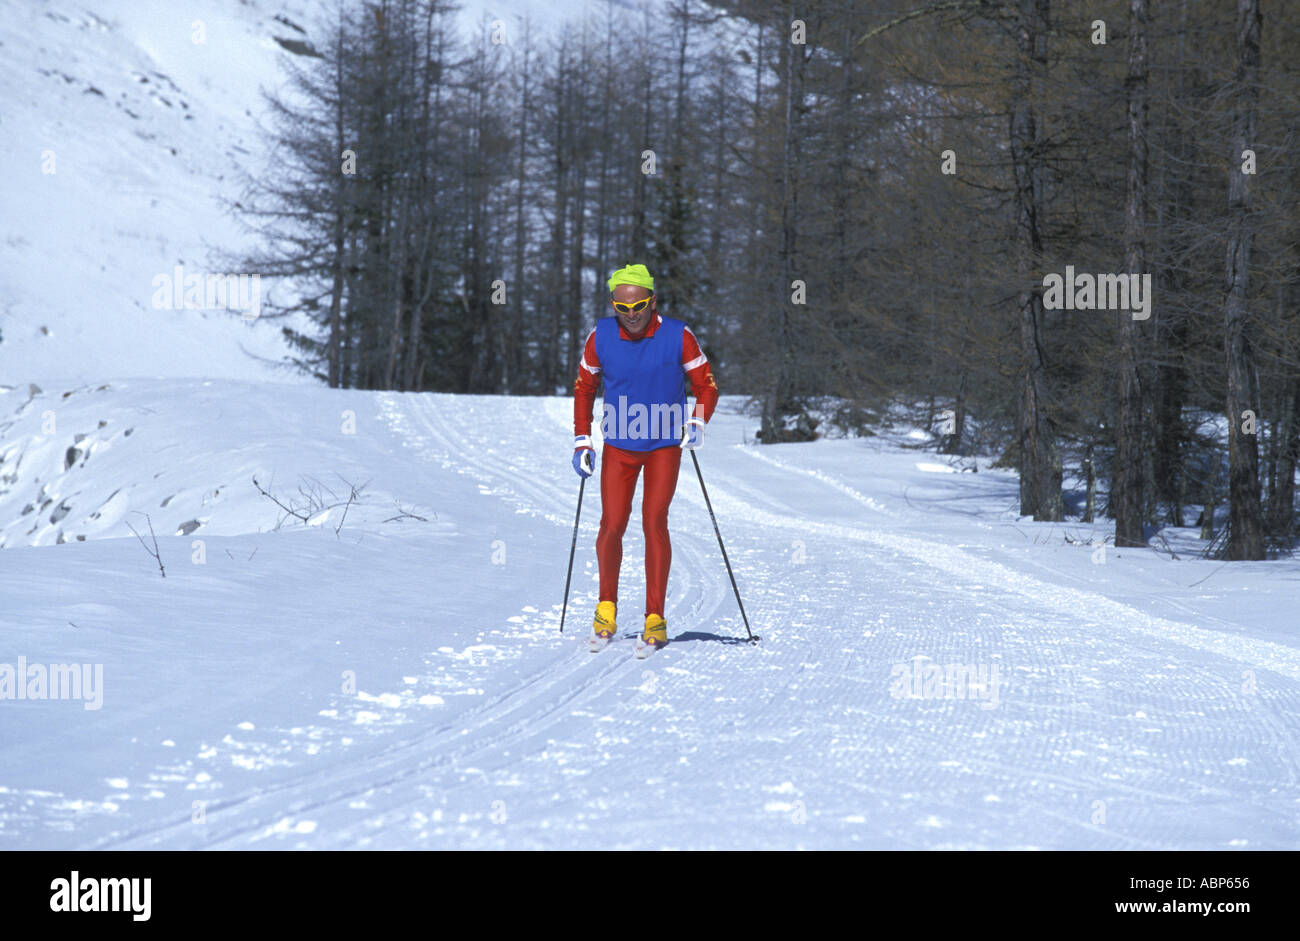 Abp 656 skiing in the gran paradiso national park stock photos